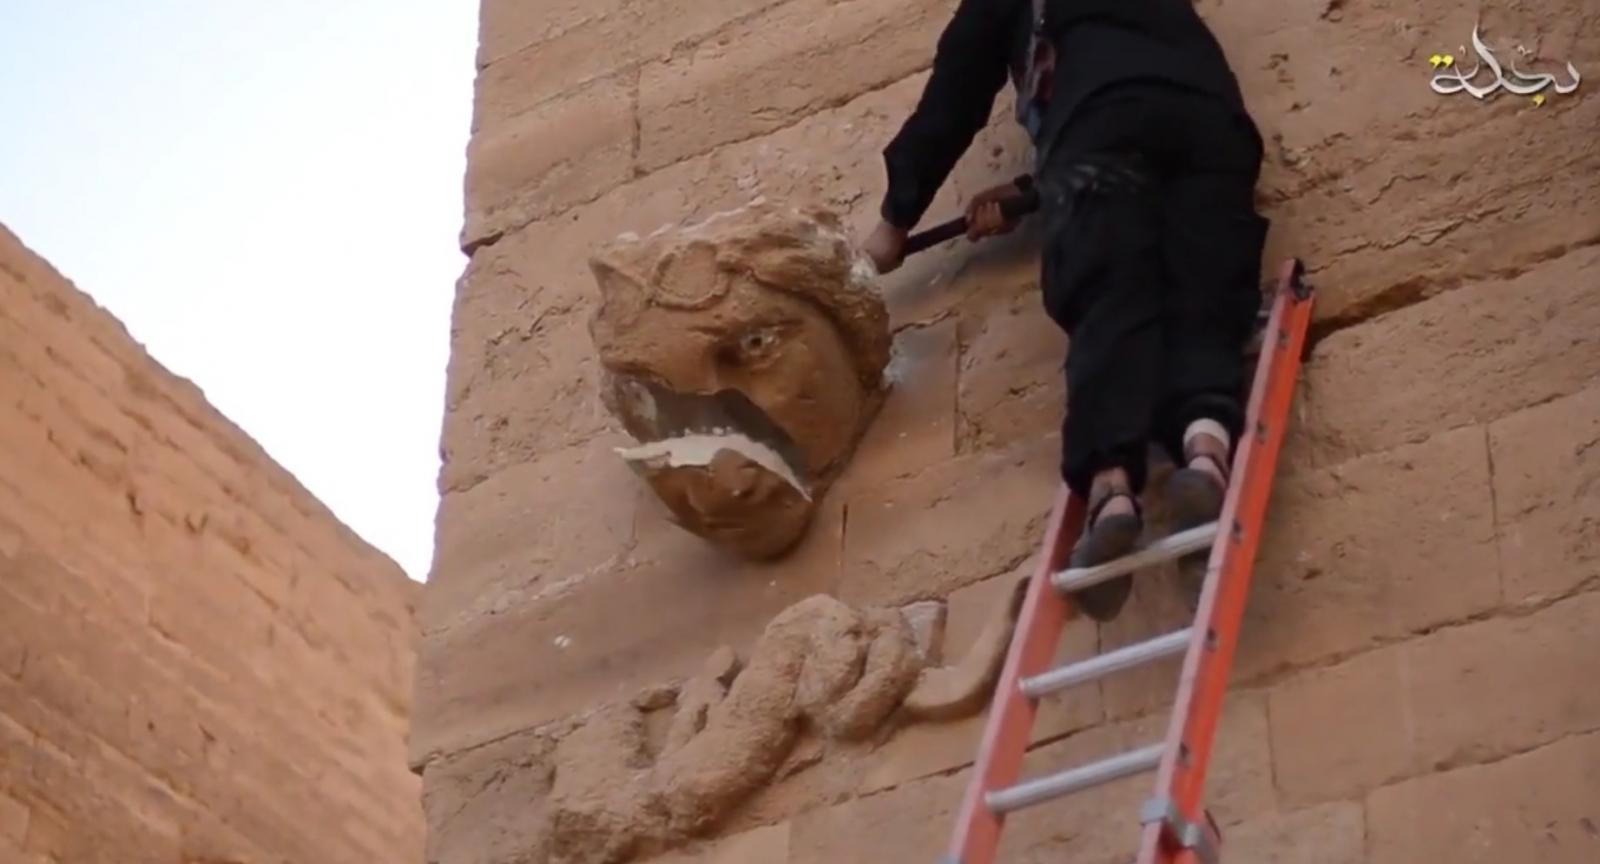 UNESCO Hatra Isis destroys artefacts